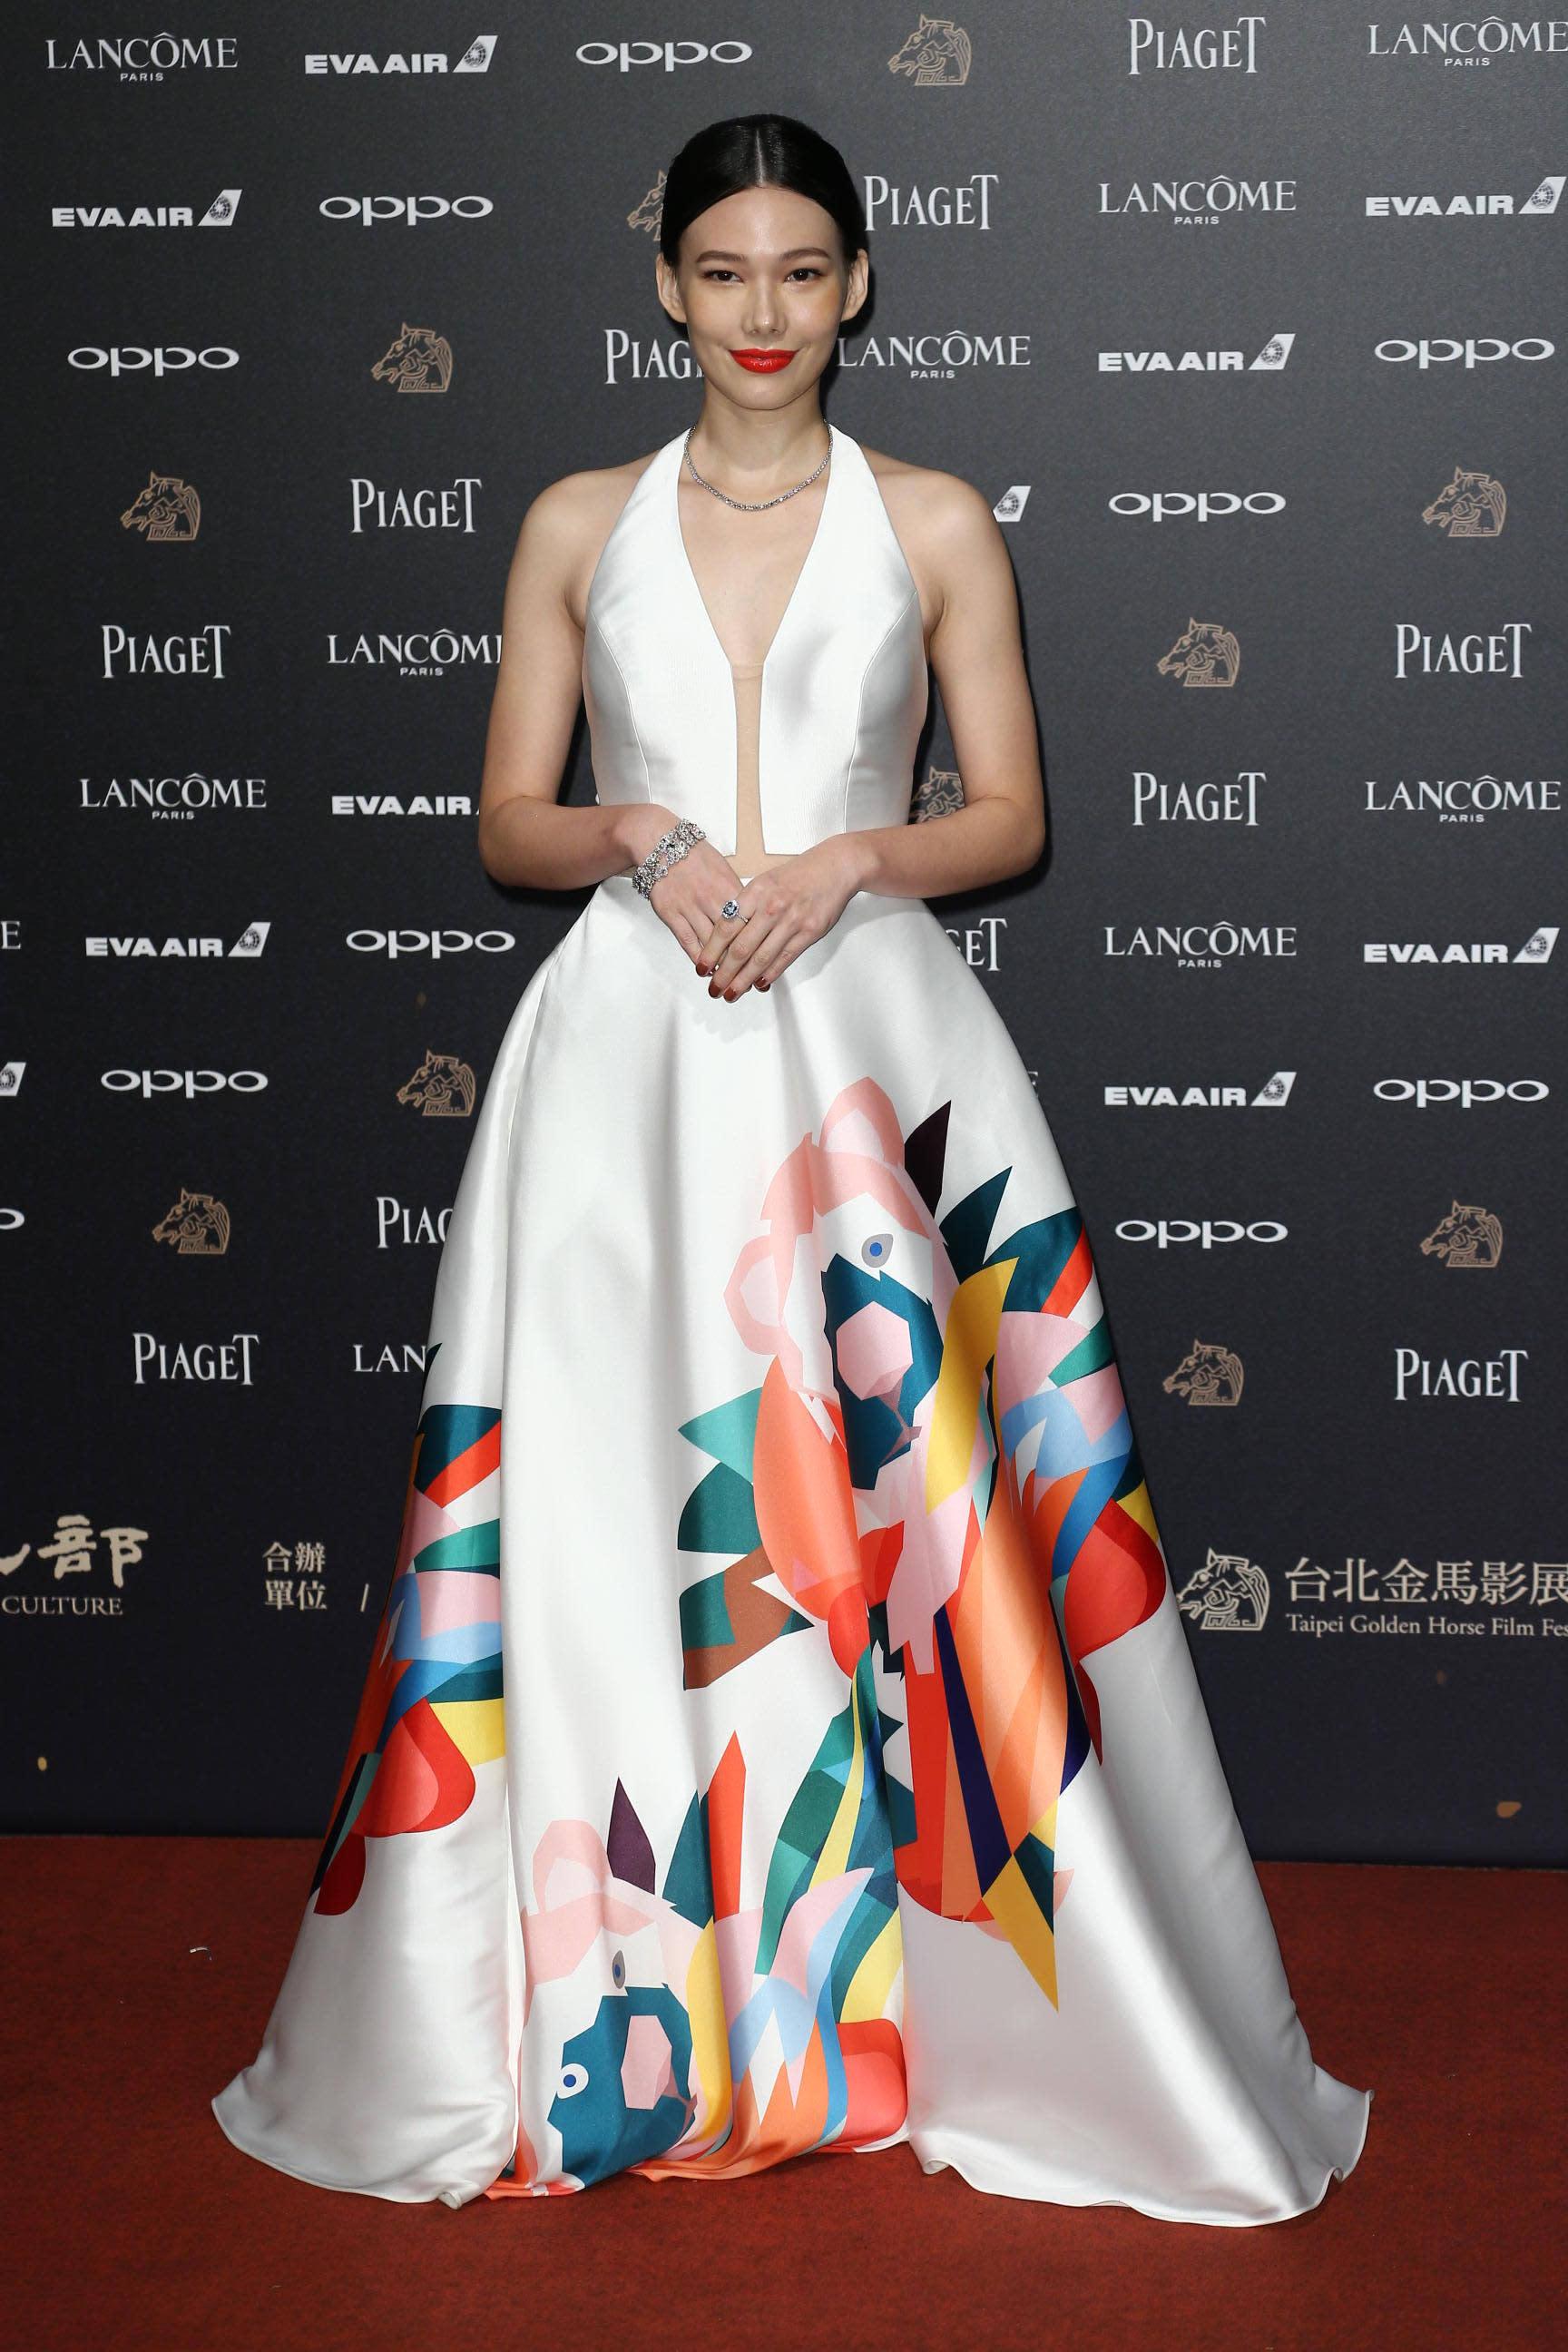 <p>同樣是《接線員》劇組的女星紀培慧,白色禮服上搭配著漂亮的彩色塗鴉,成為本次金馬紅毯的的一大亮點!簡單的中分乾淨髮型,身上搭配Tiffany & Co.珠寶,散發著經典美(影像提供:達志影像) </p>